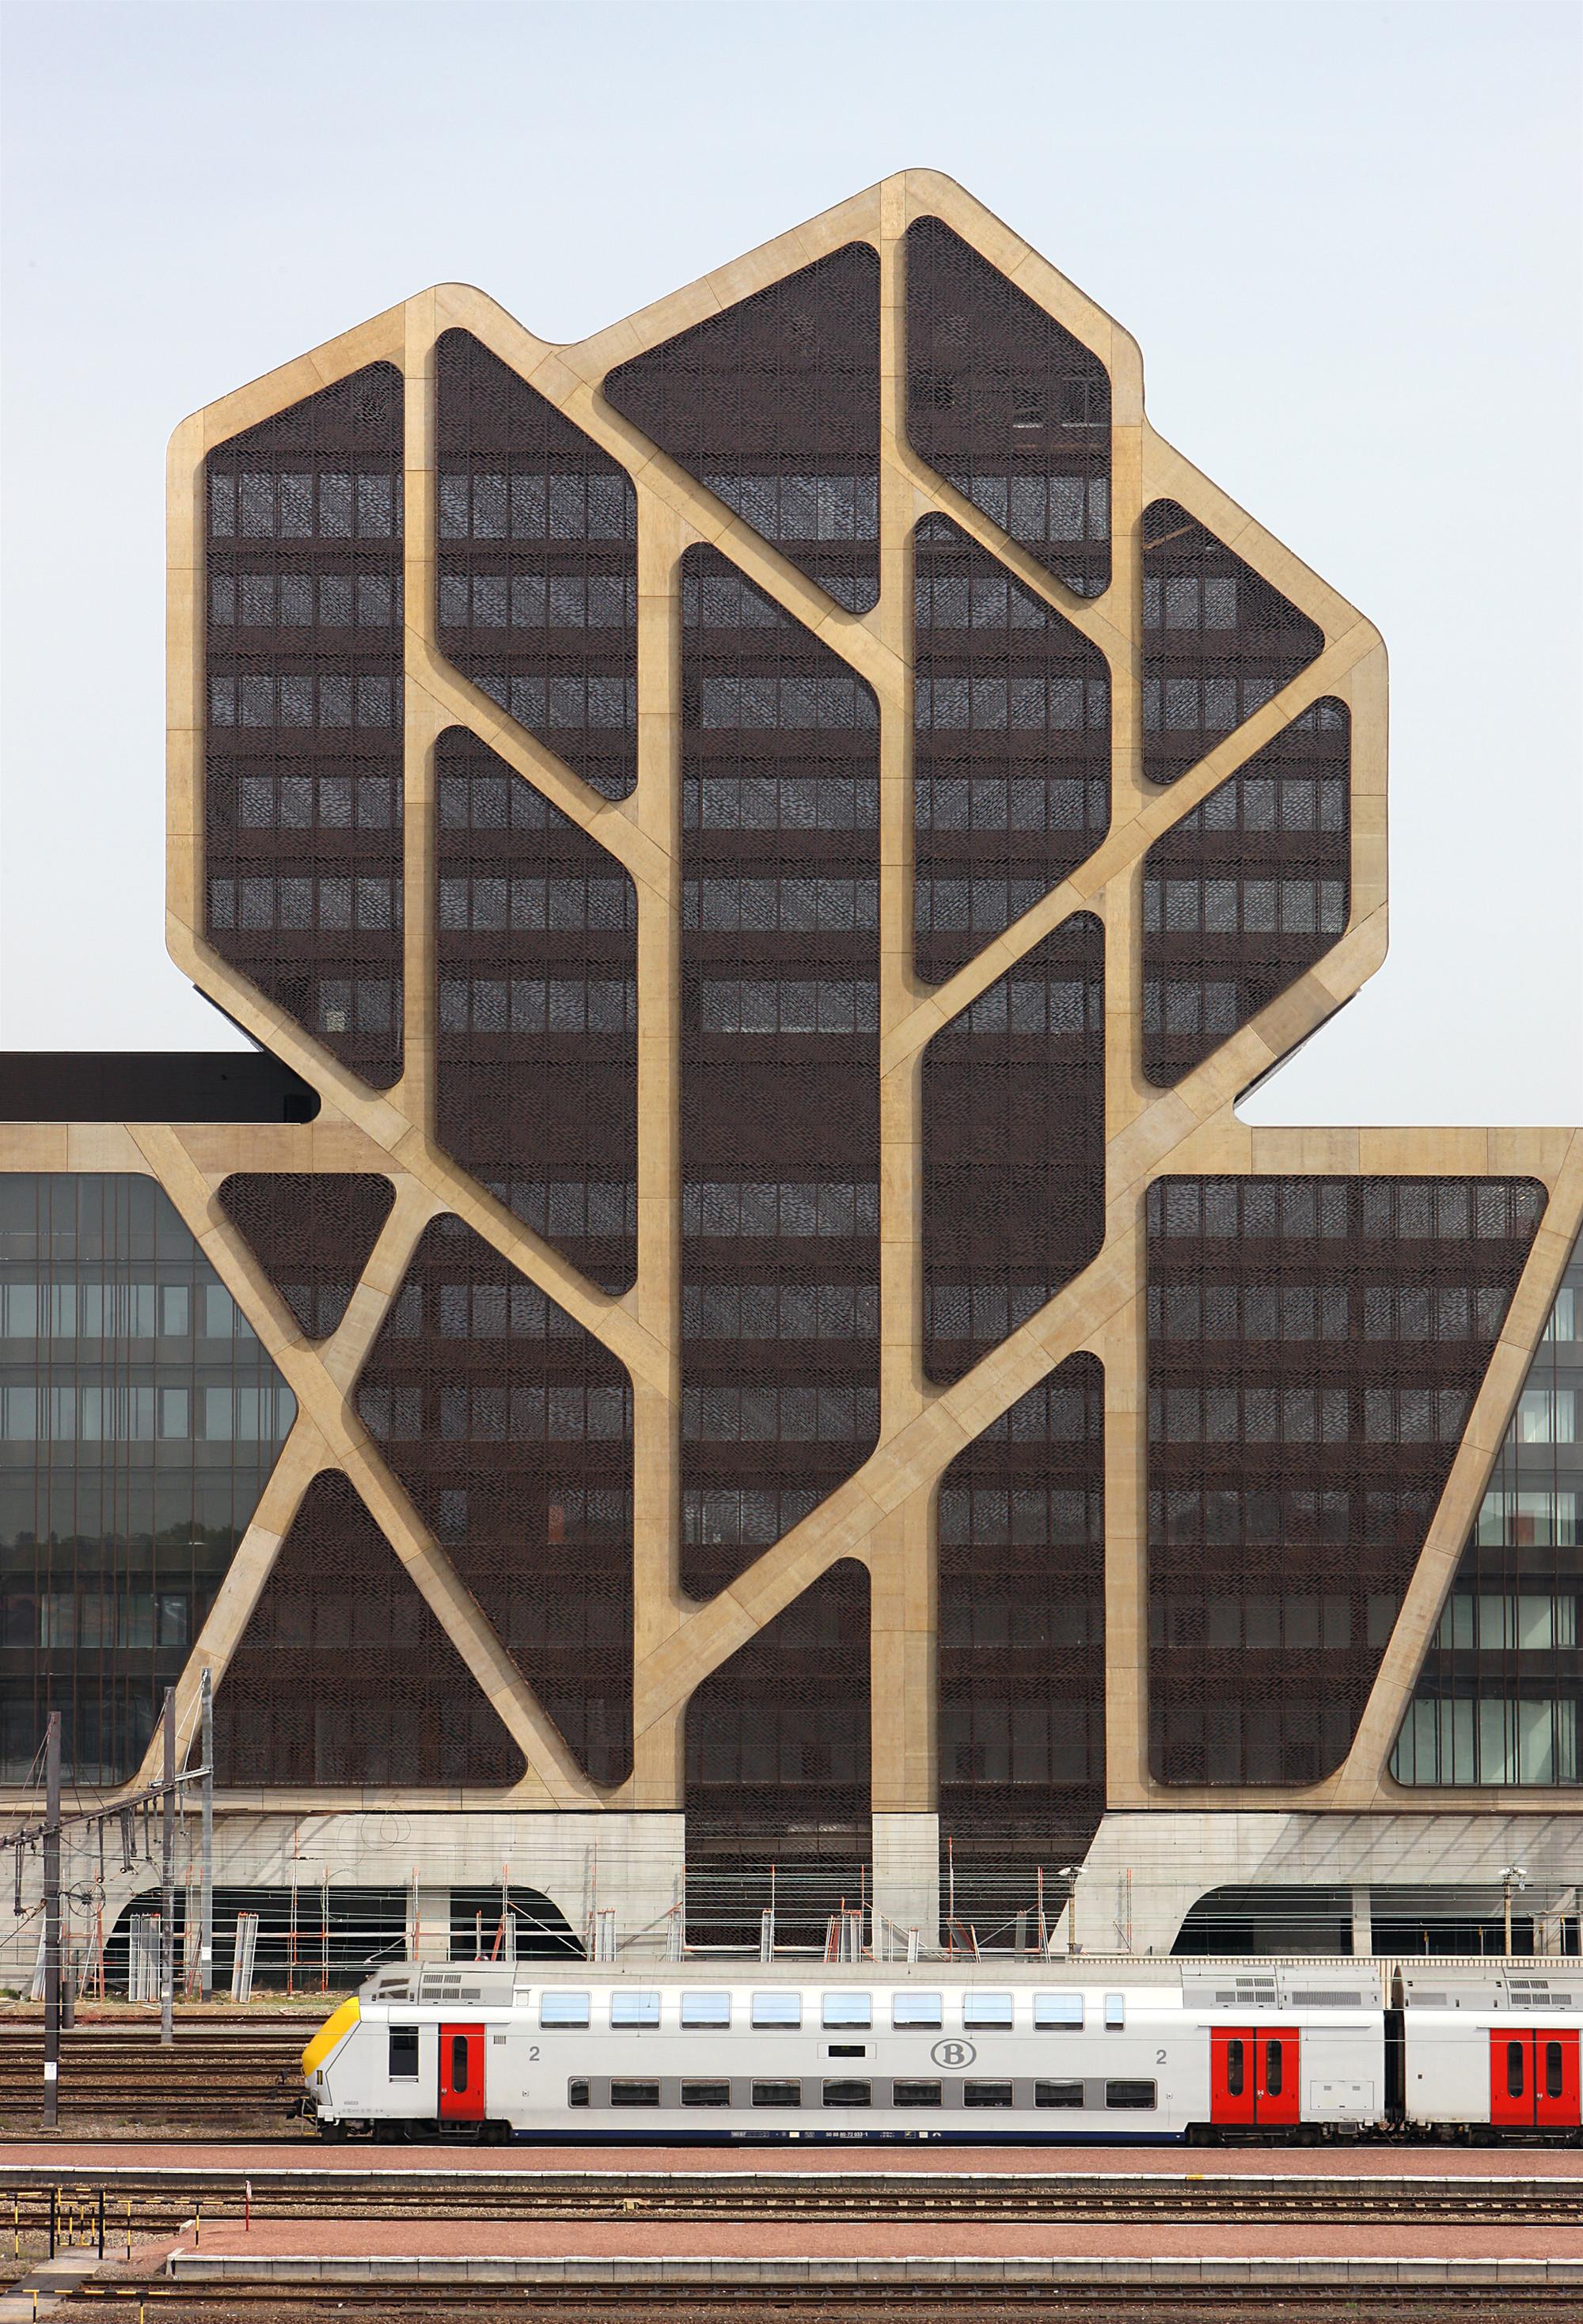 Hasselt Court of Justice / J. Mayer H. Architects + a2o architecten + Lens°Ass architecten